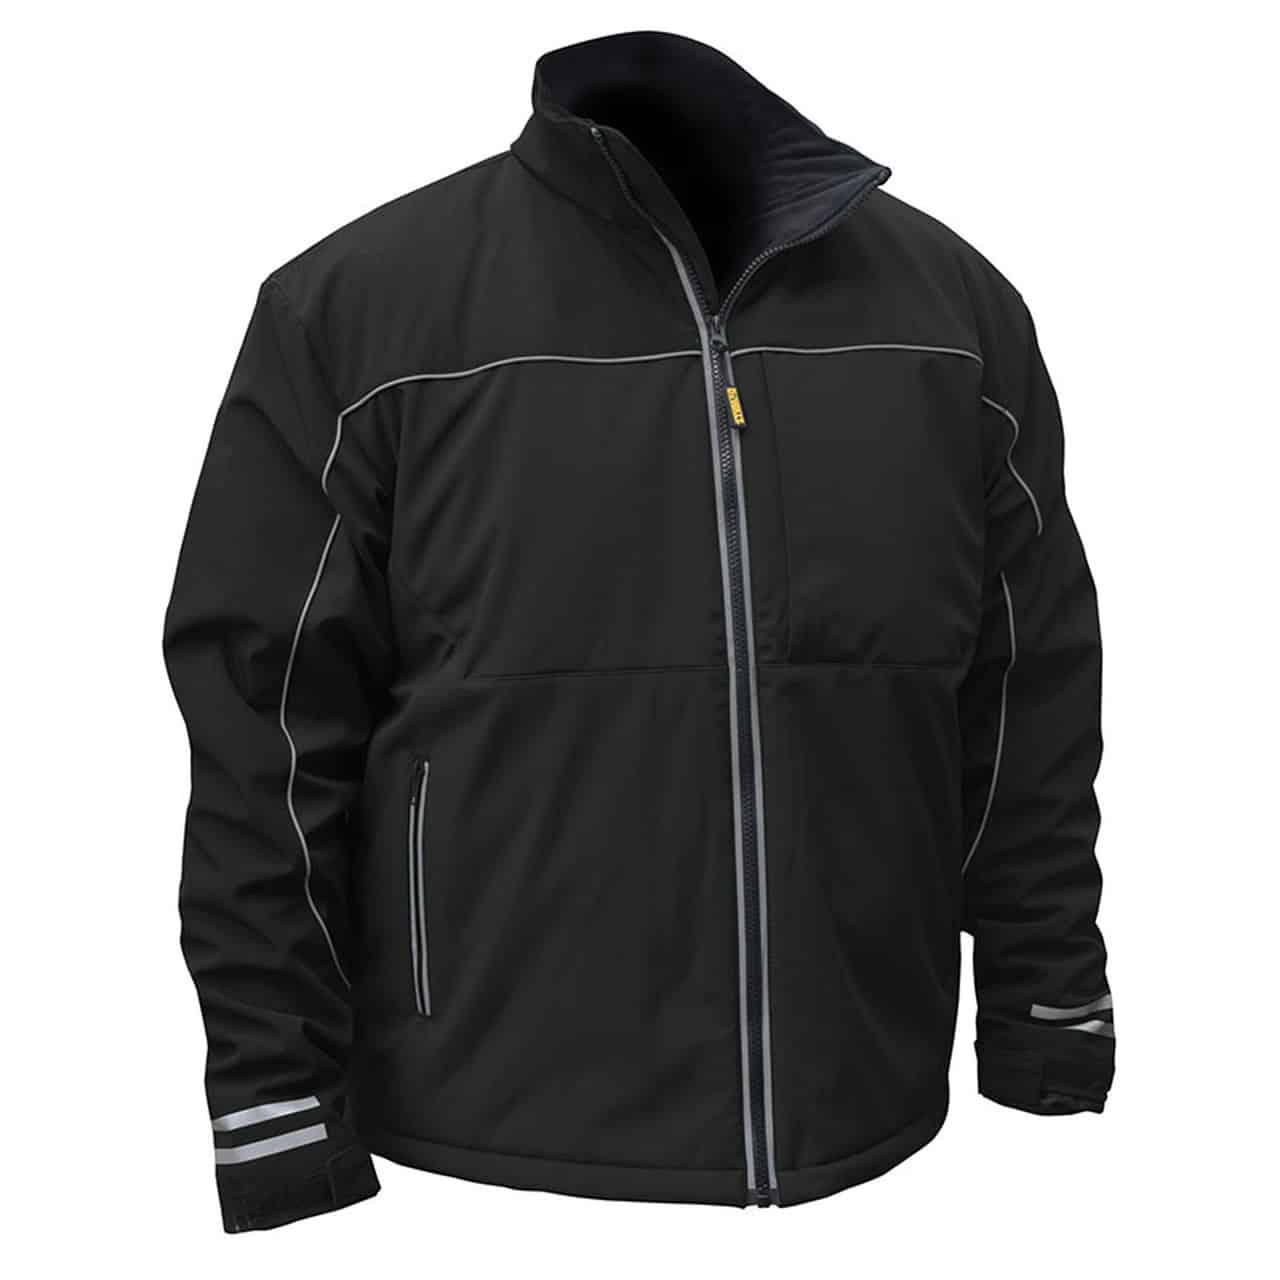 Heated Lightweight Soft Shell Jacket 5